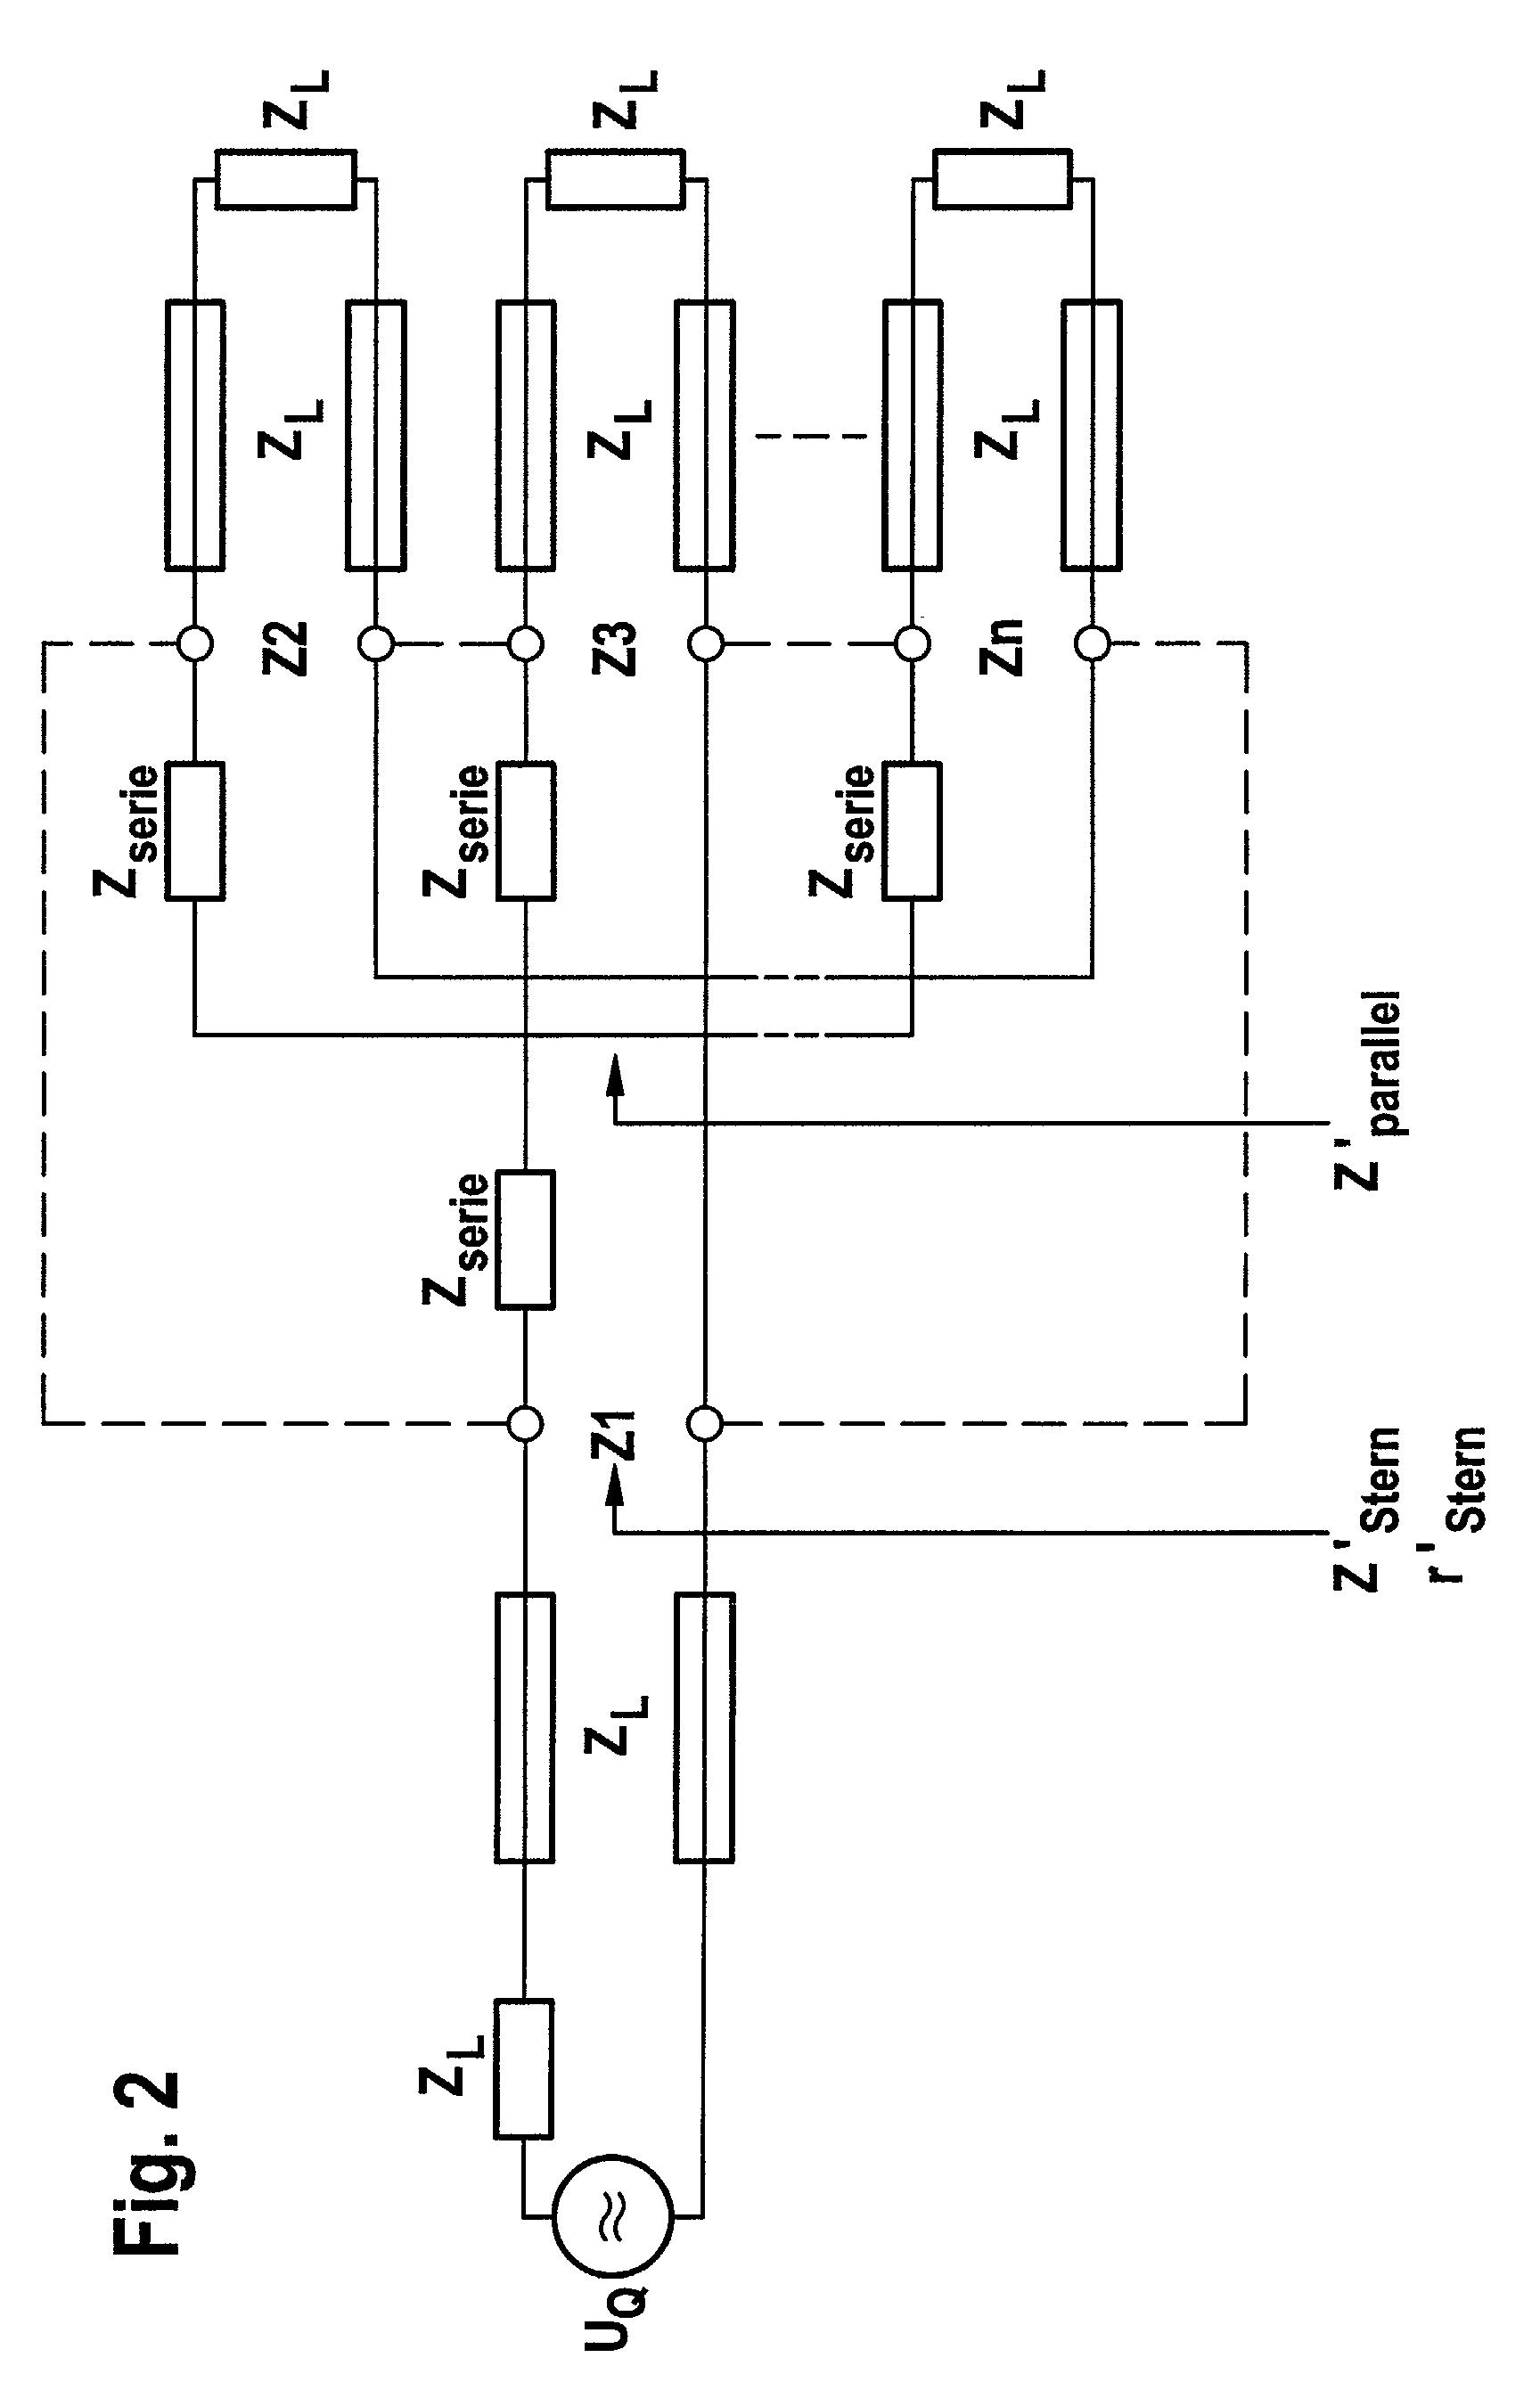 Nett Ez Kabel Kabelbaum Diagramm Ideen - Elektrische Schaltplan ...